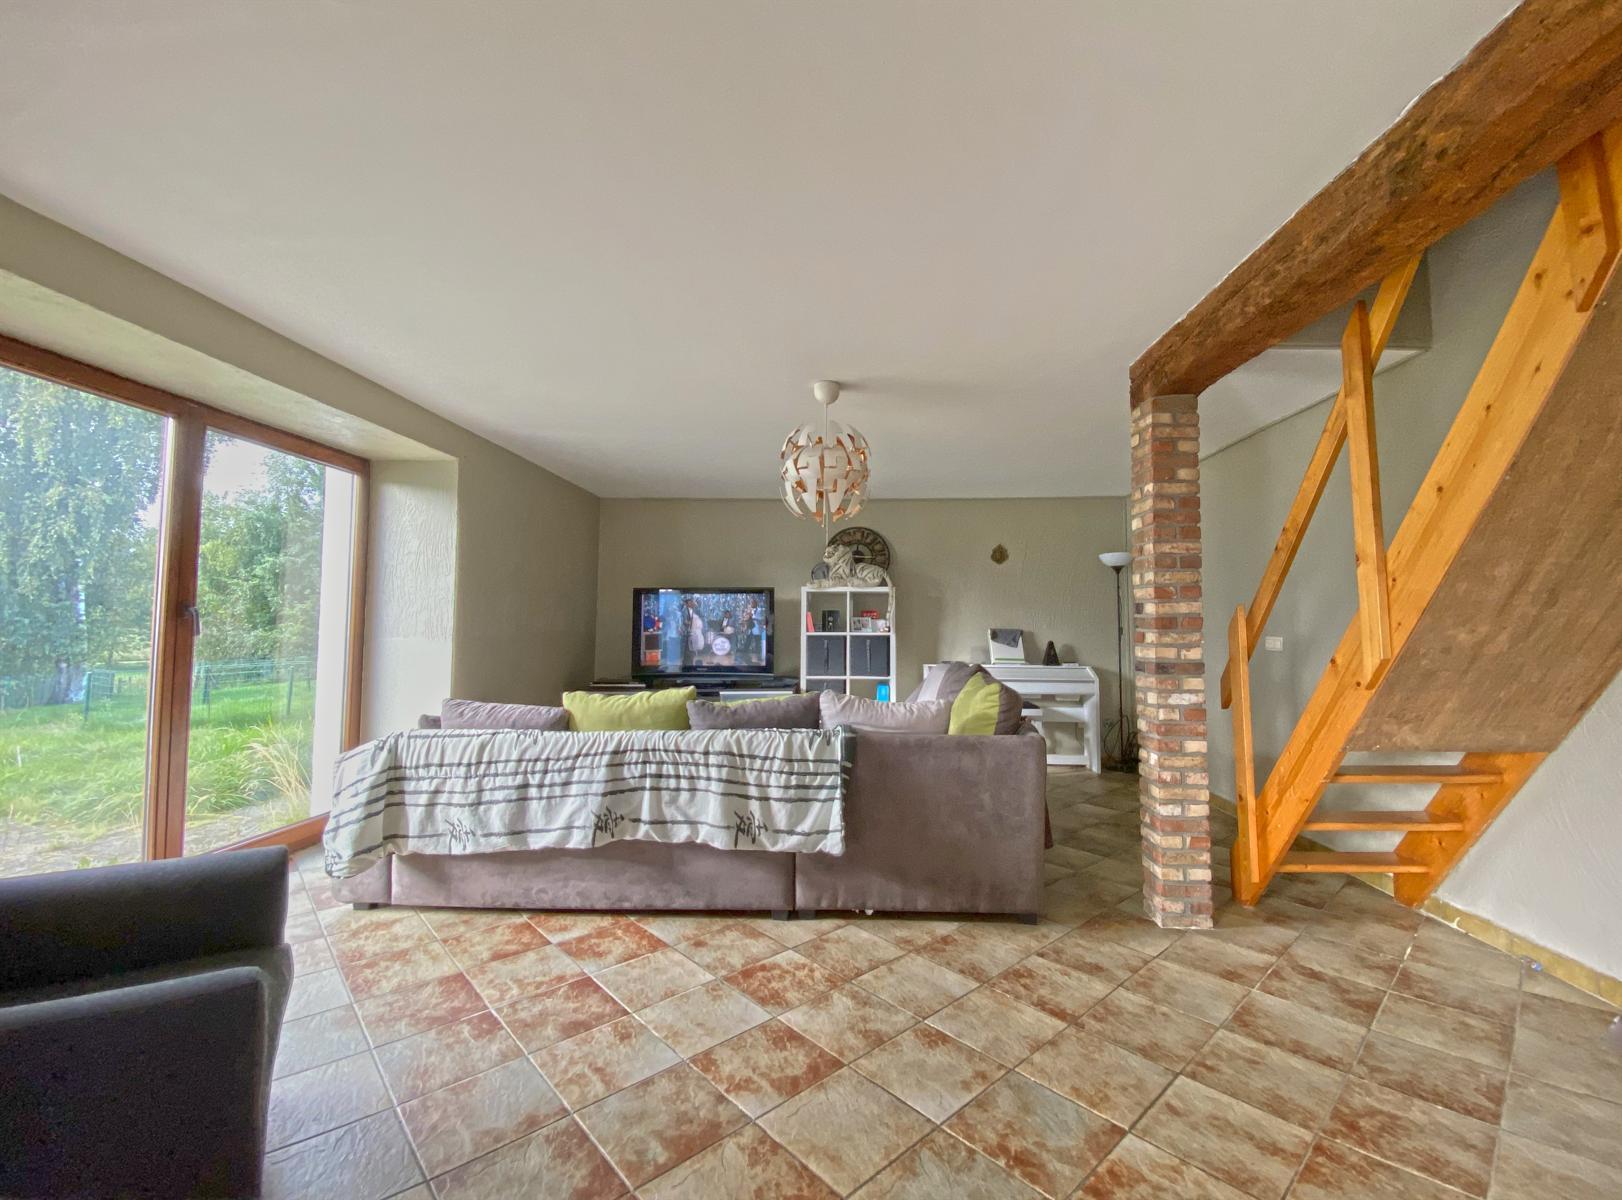 Maison - Libramont-Chevigny - #4508306-2